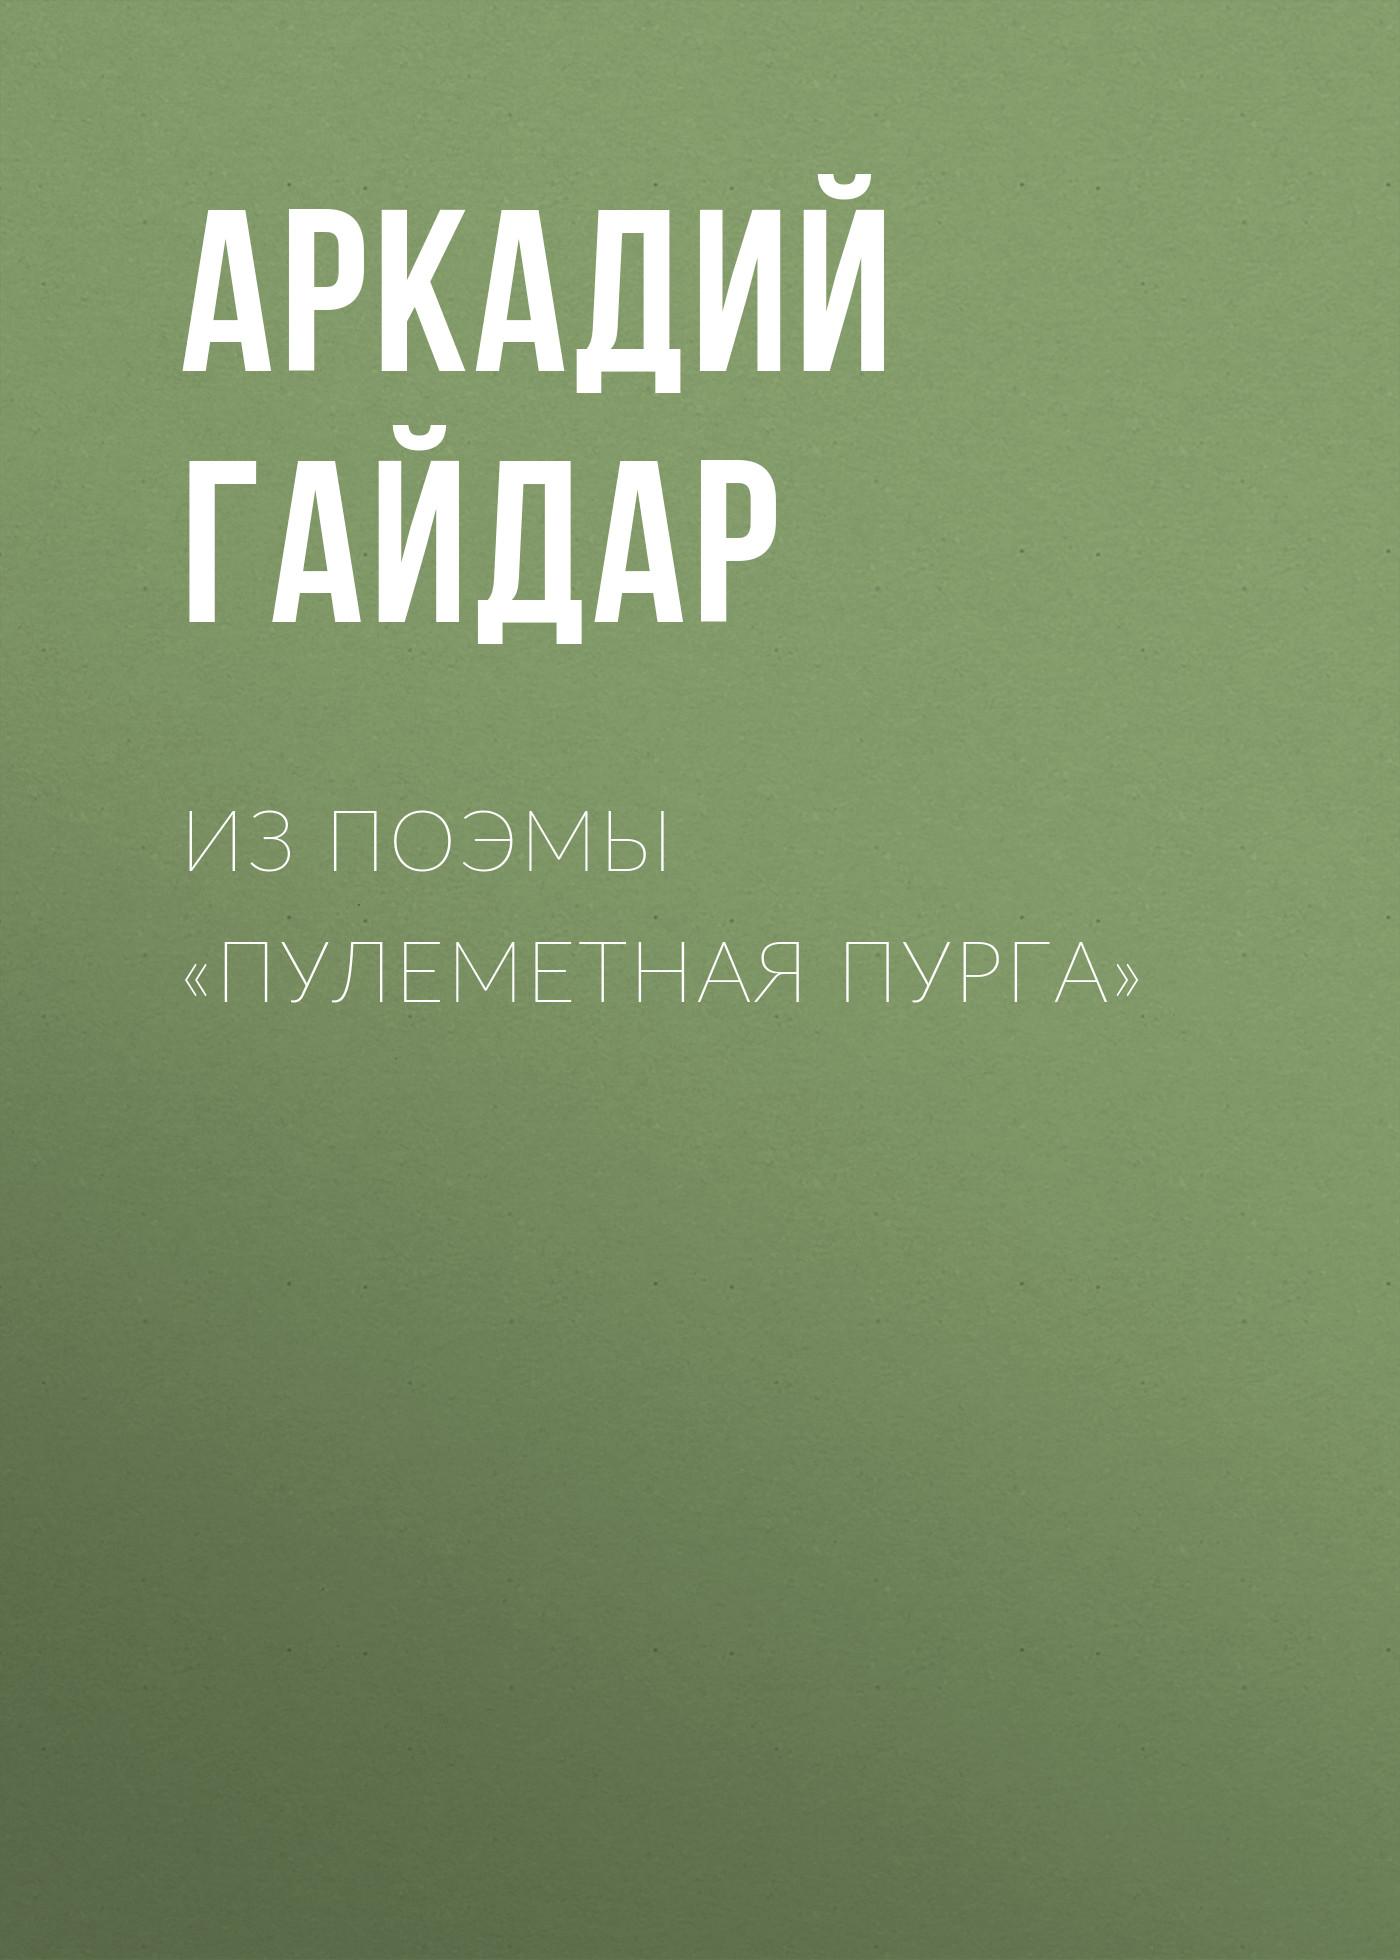 Аркадий Гайдар Из поэмы «Пулеметная пурга» гайдар аркадий петрович тимур и его команда